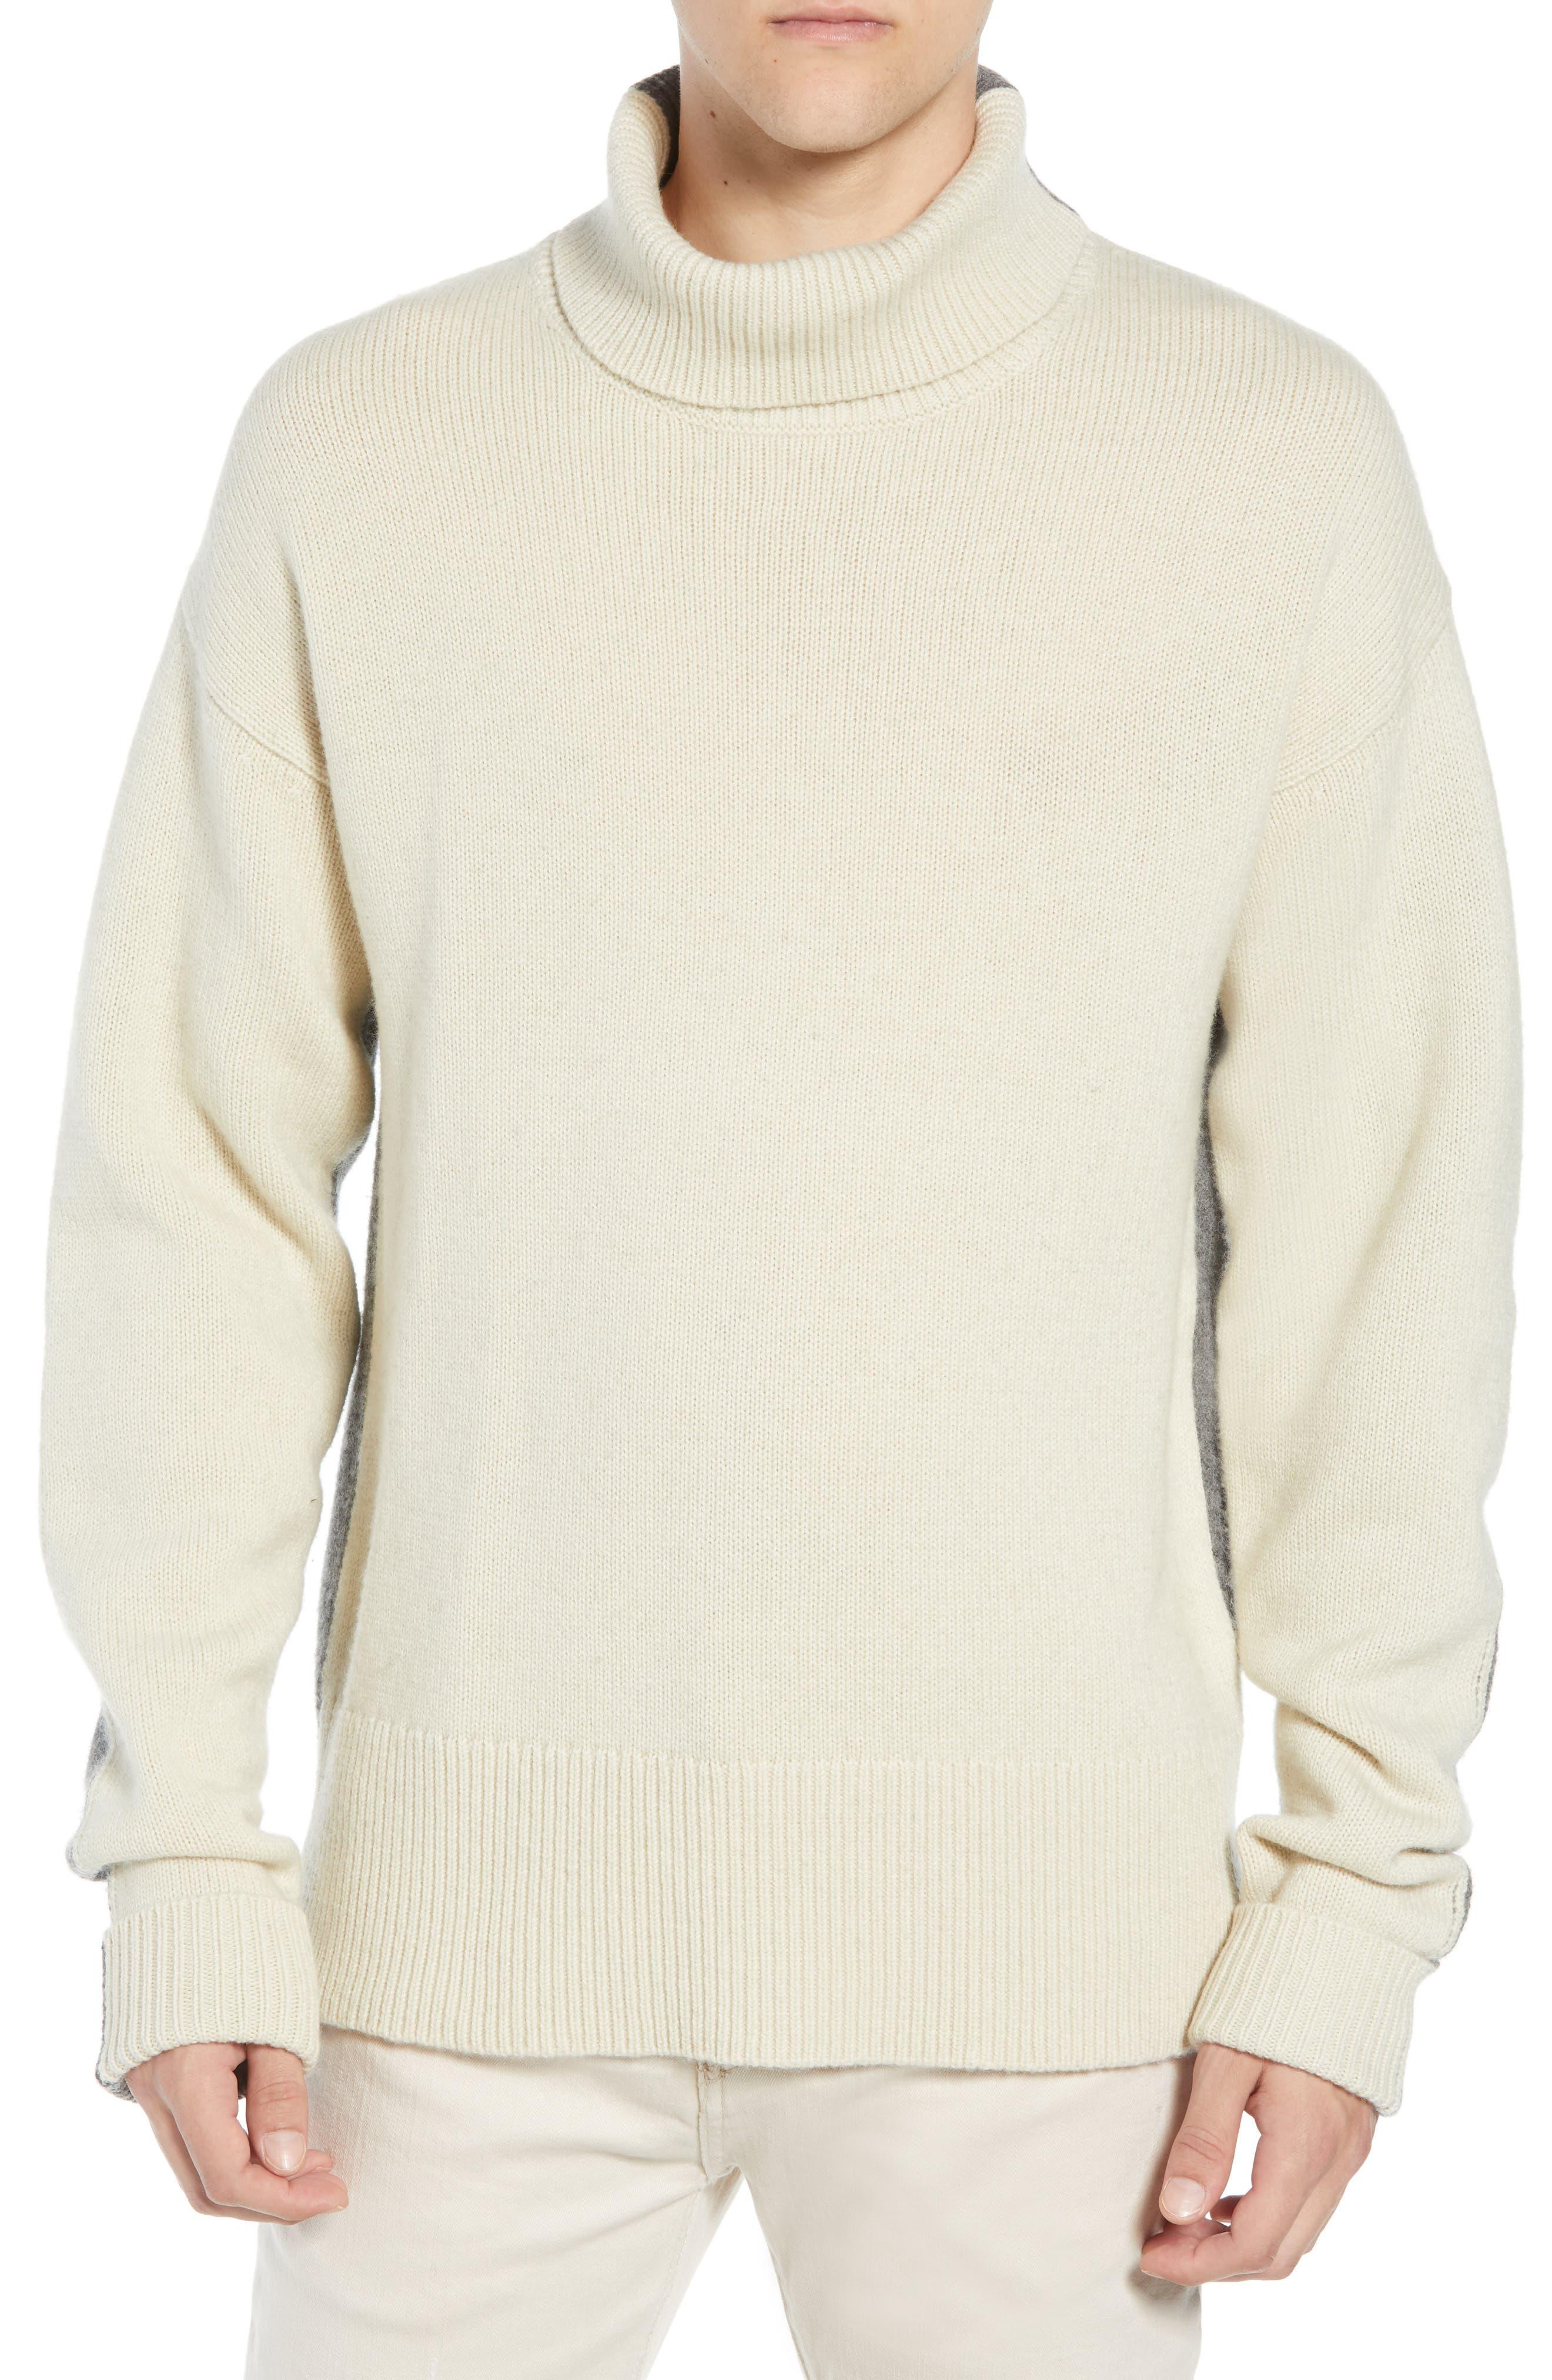 Colorblock Turtleneck Sweater,                             Main thumbnail 1, color,                             FOG MID GREY MELANGE